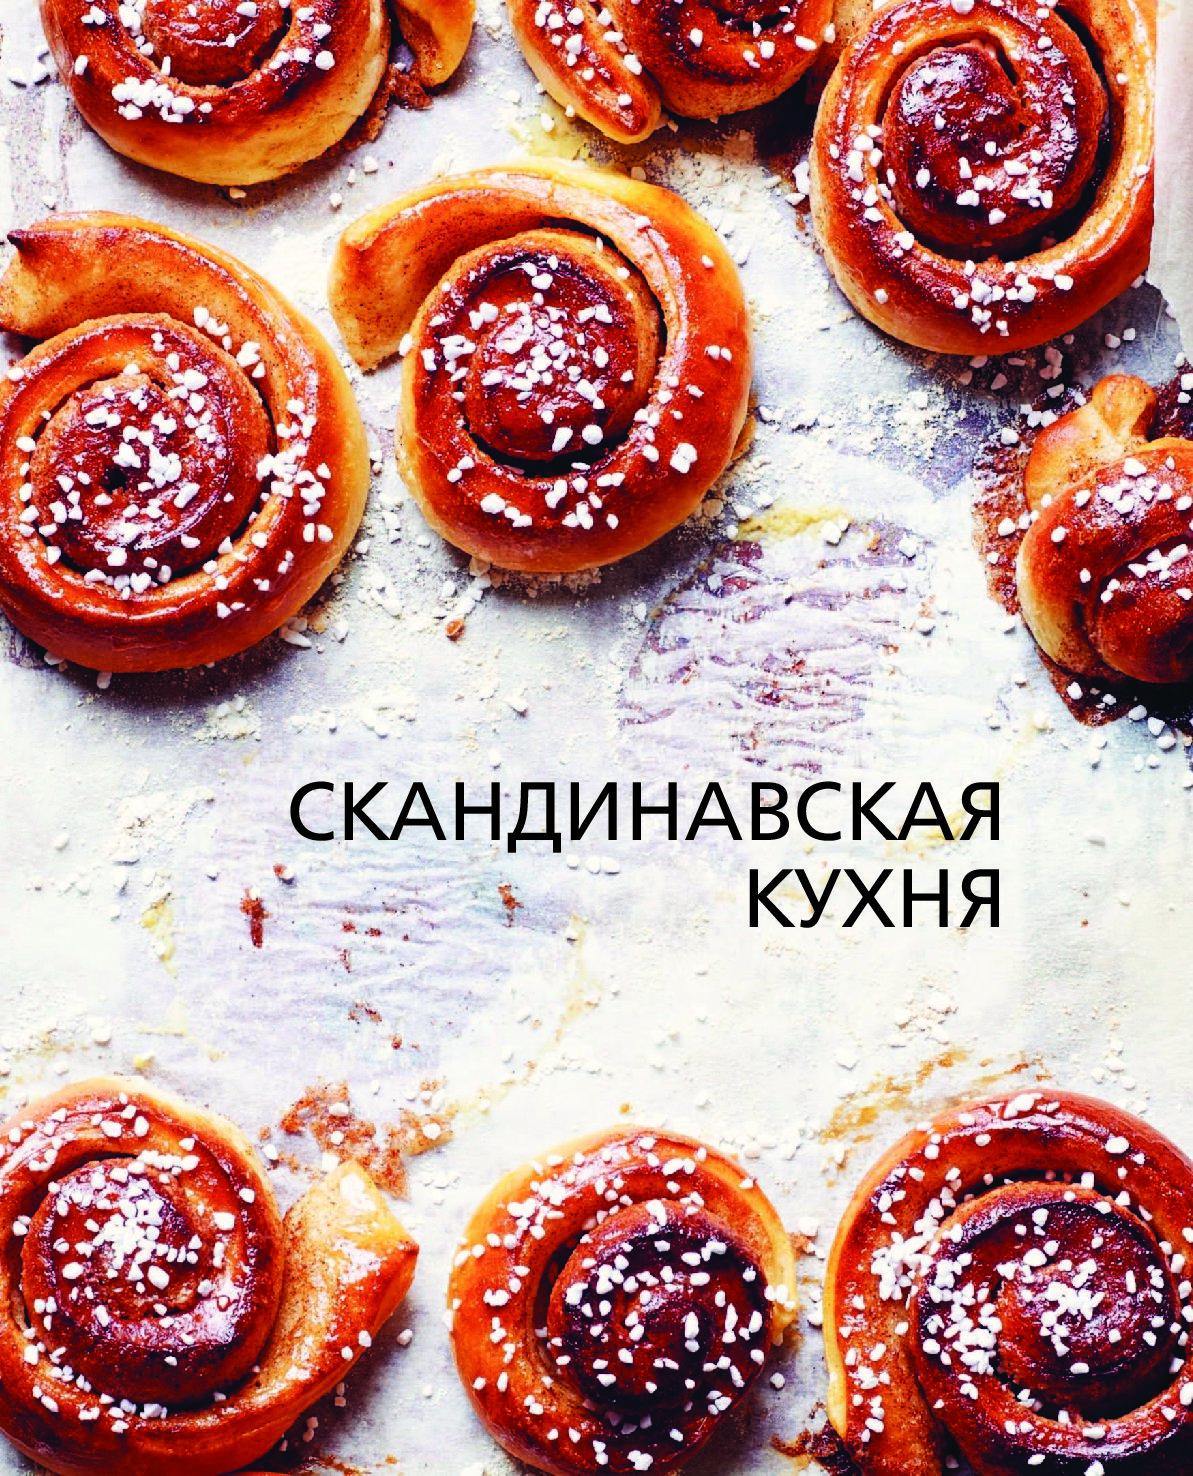 "Книга ""Скандинавская кухня. Простая и уютная еда на любой случай"" Books Books 9785699998081 фото 4"